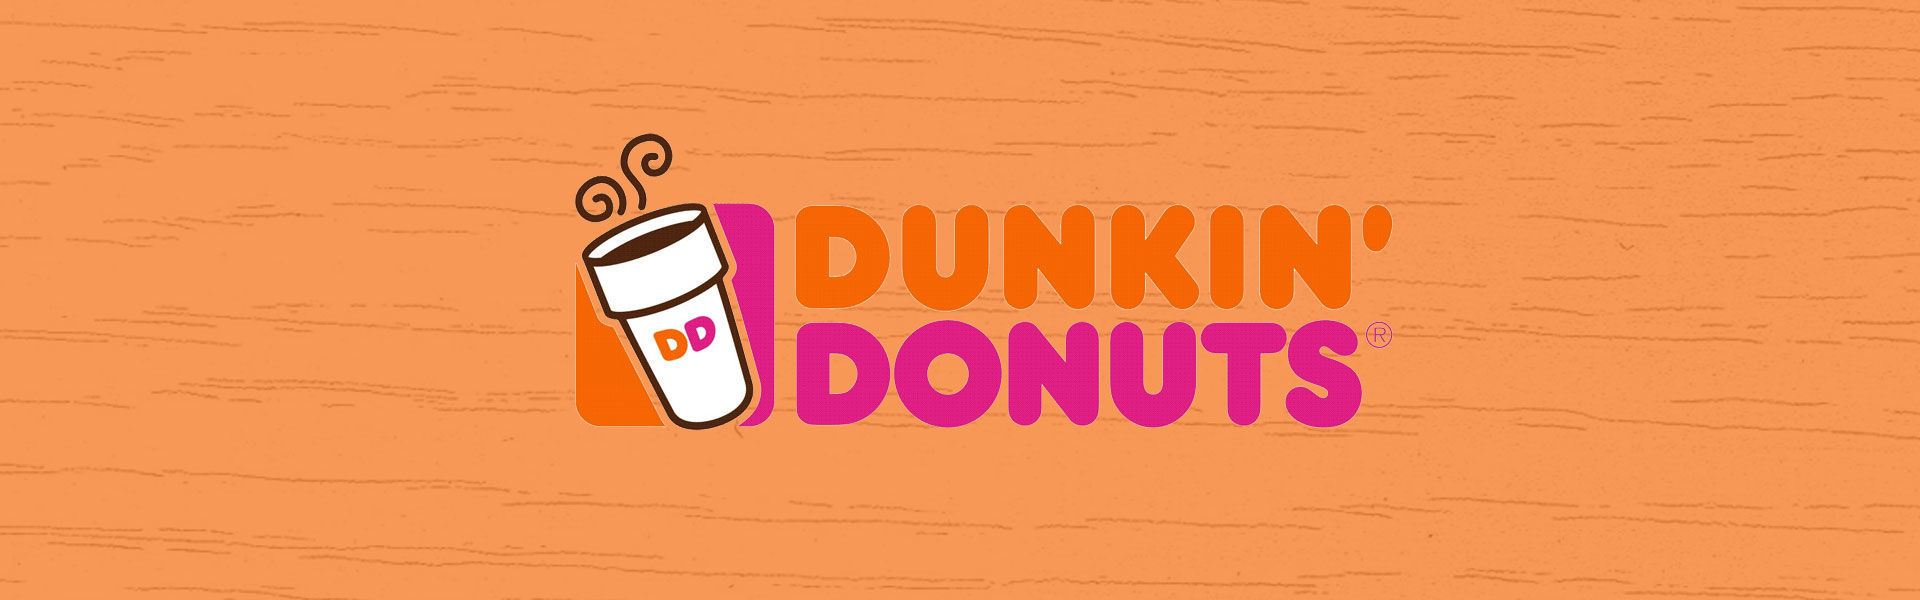 Dunkin Donuts Header